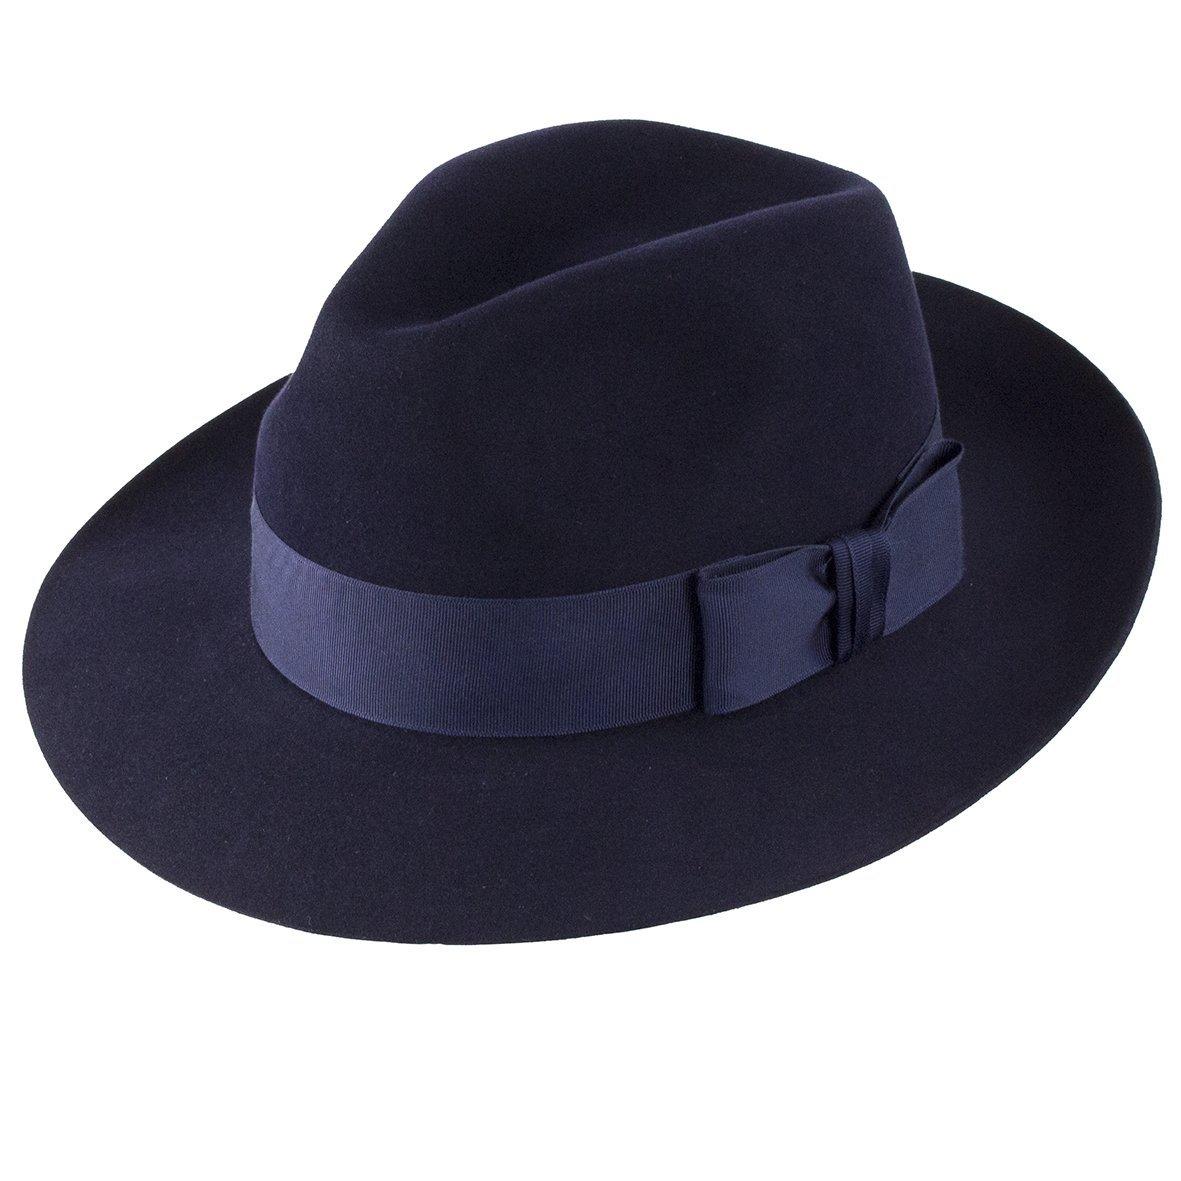 Christys Hats Knightsbridge Fur Felt Trilby - Navy